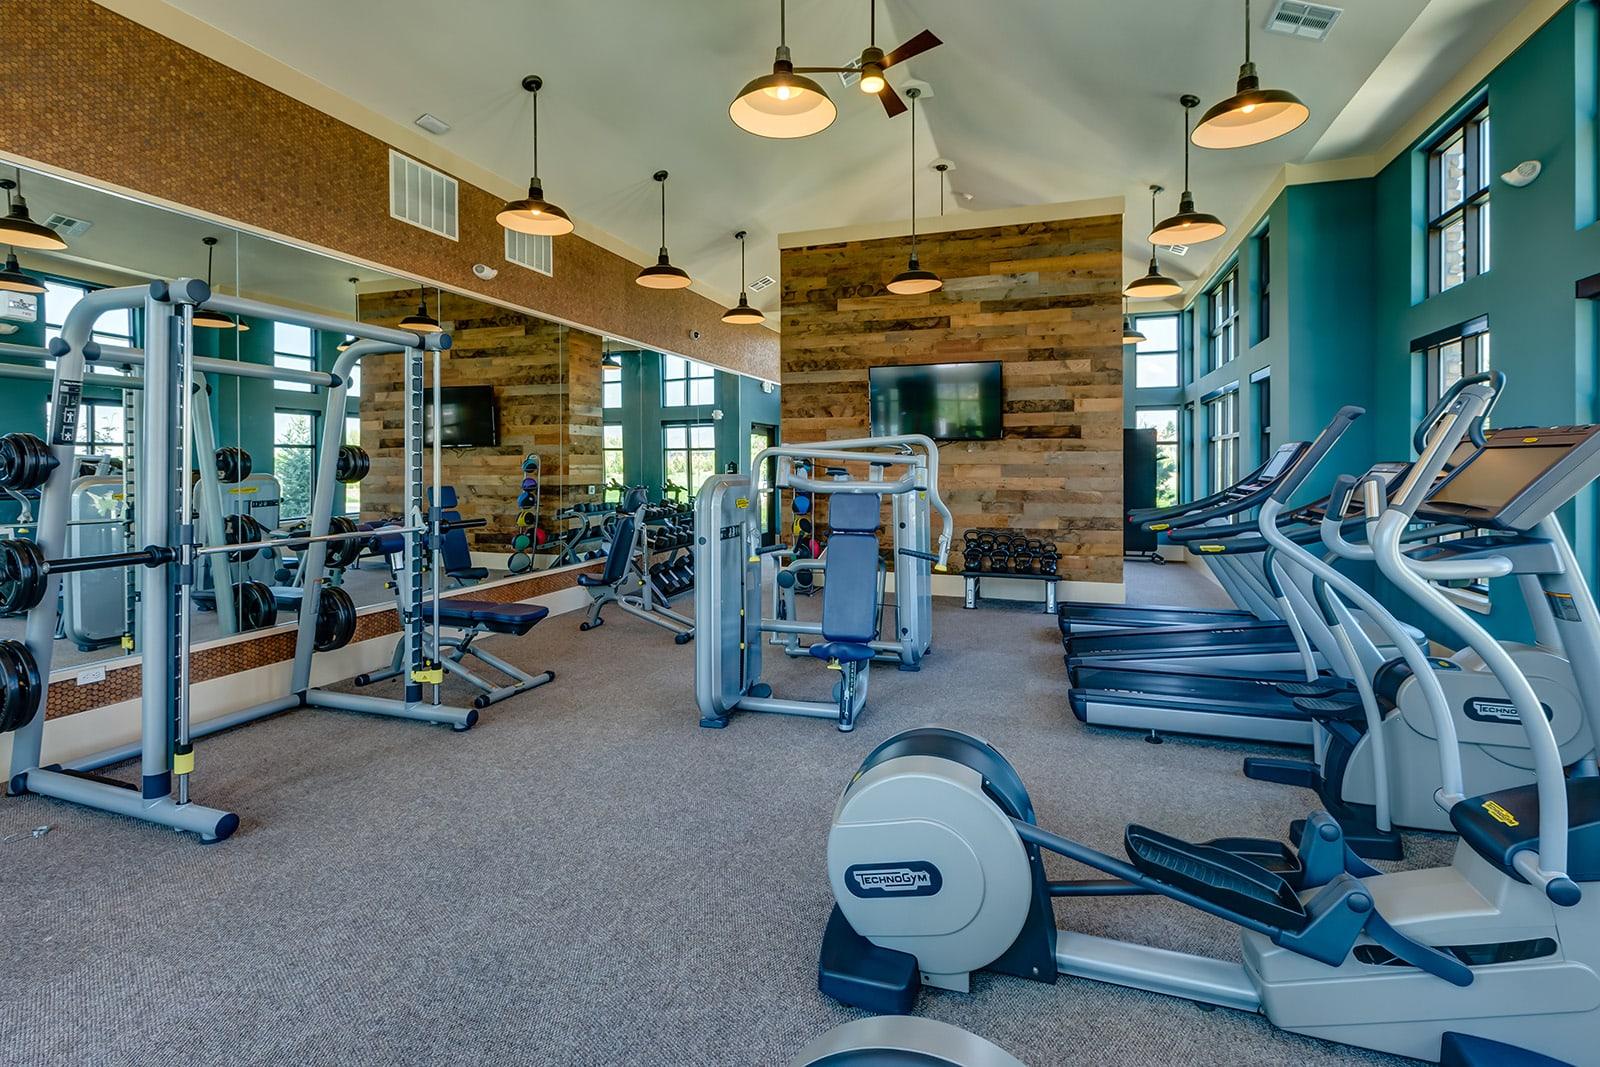 Fitness center at Windsor at Pinehurst, 3950 S Wadsworth Blvd, 80235